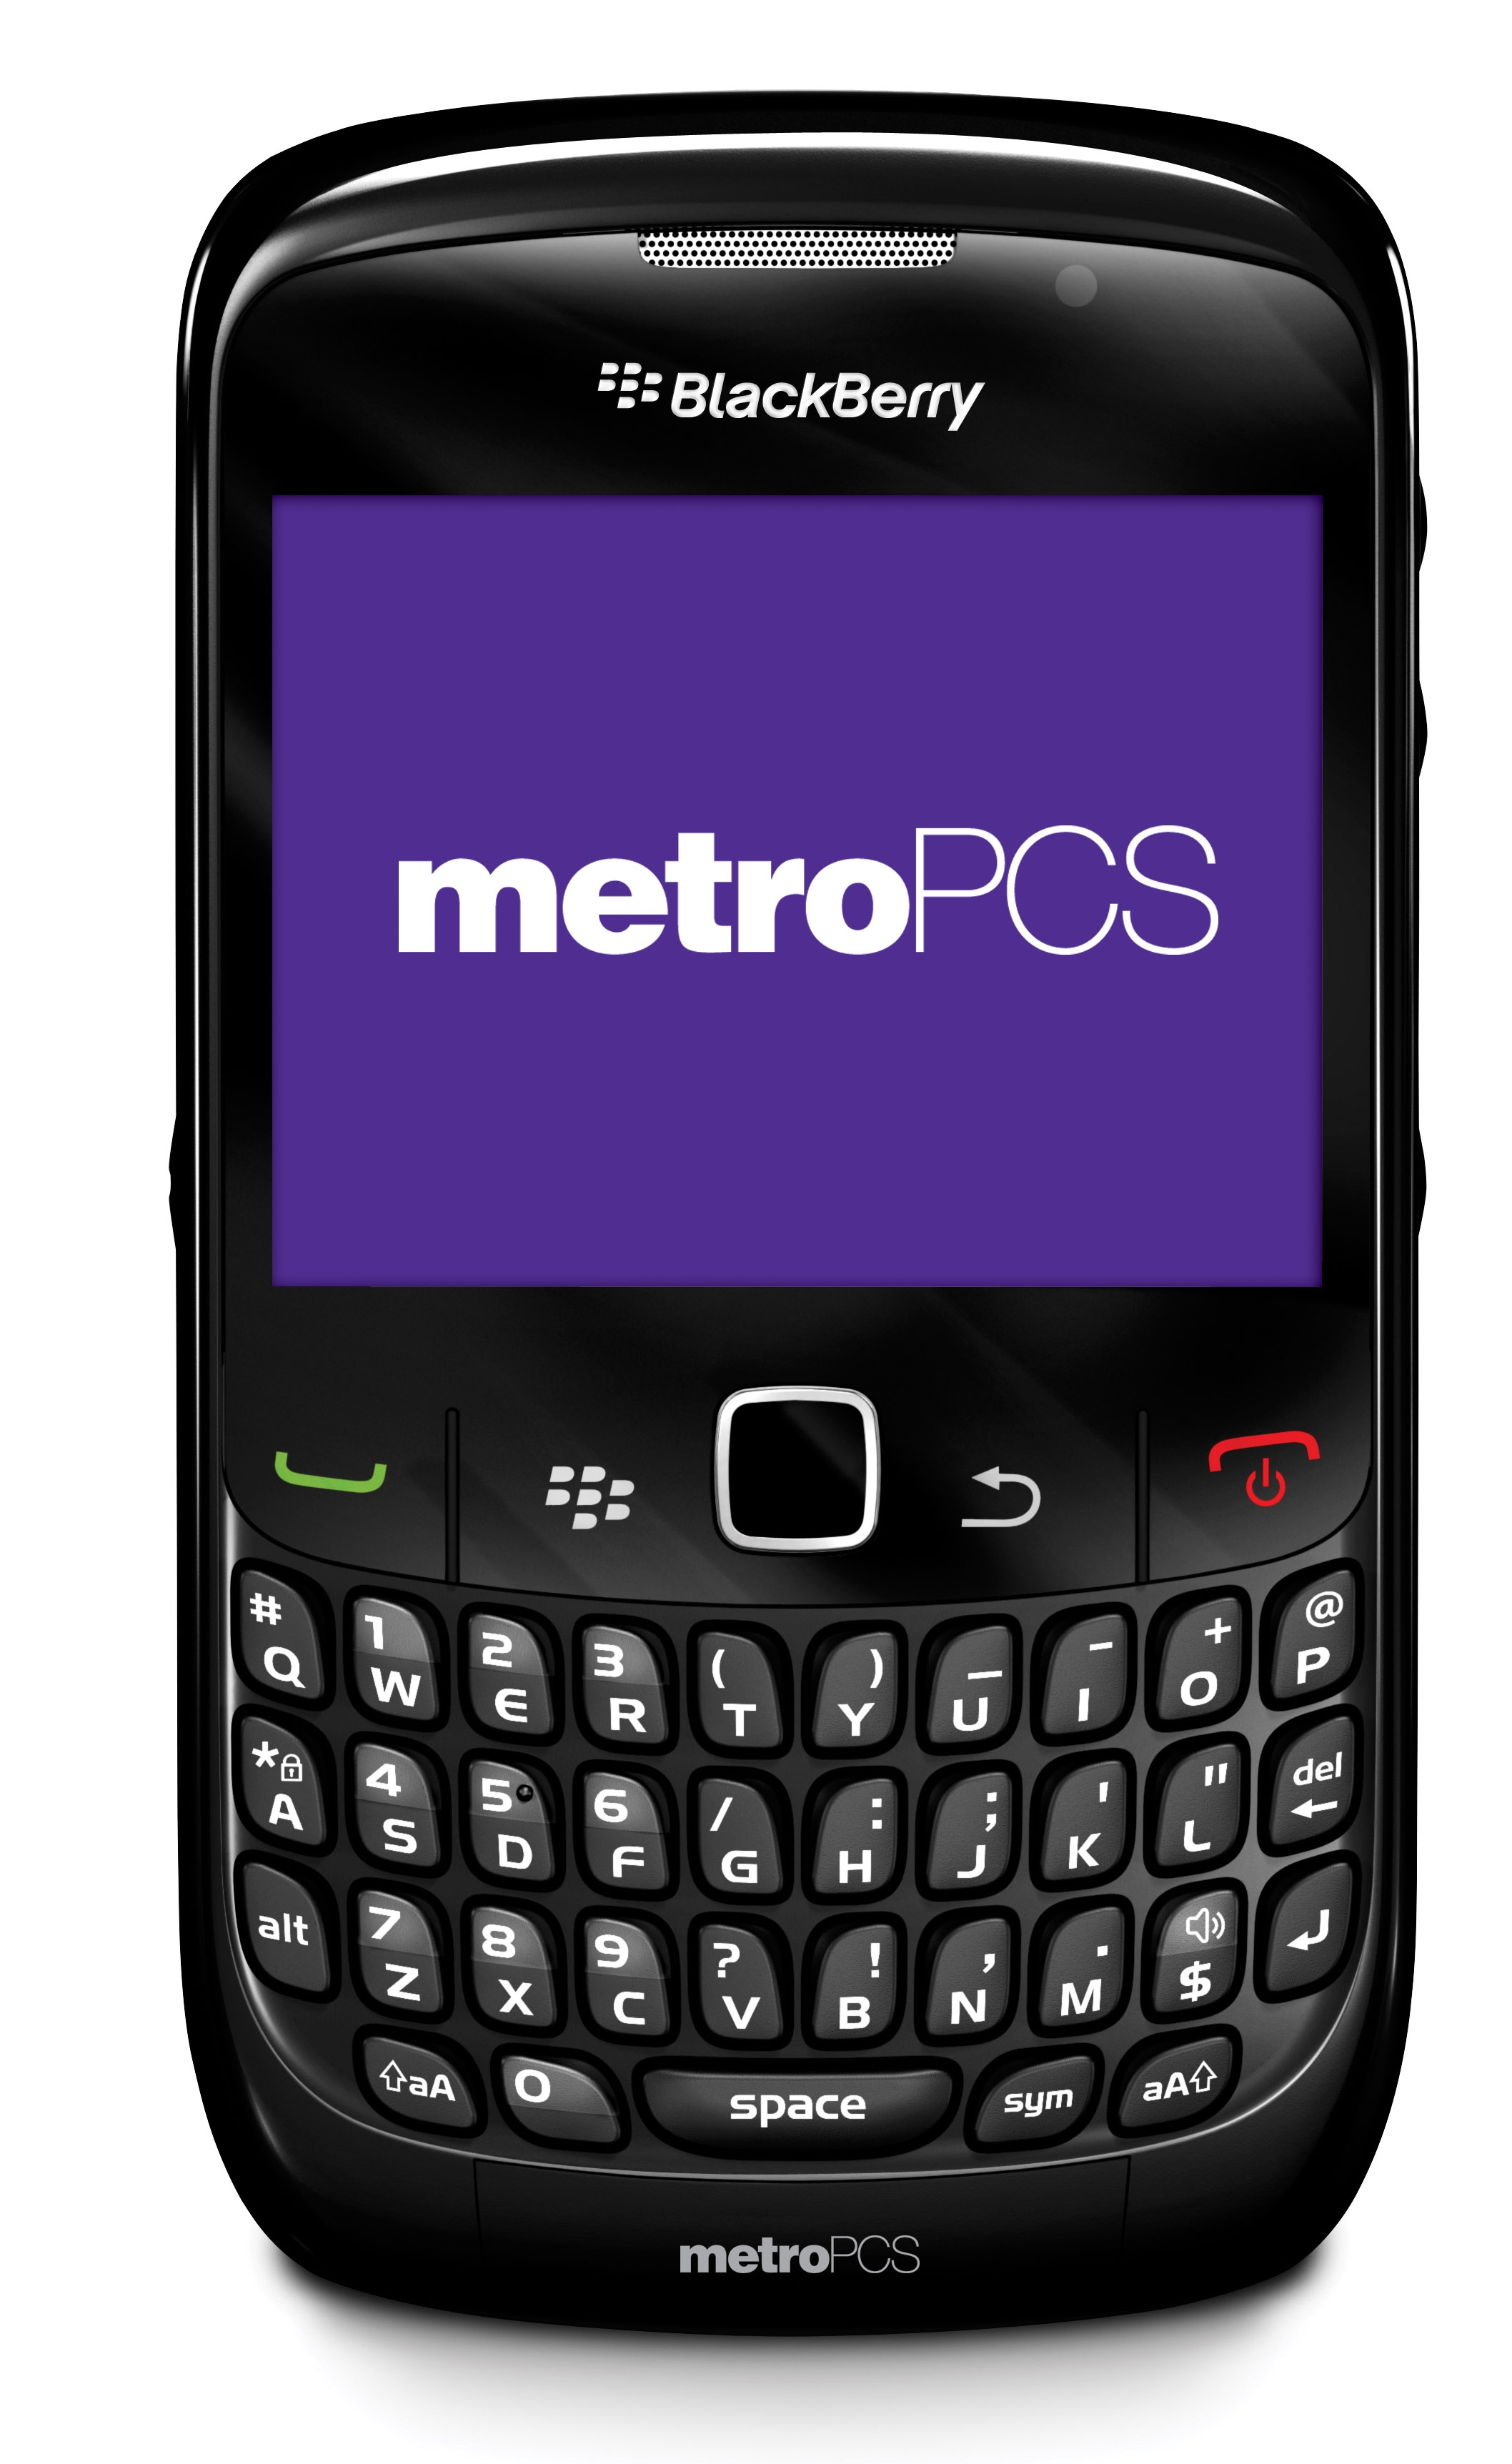 10 Great Prepaid/No Contract Phones